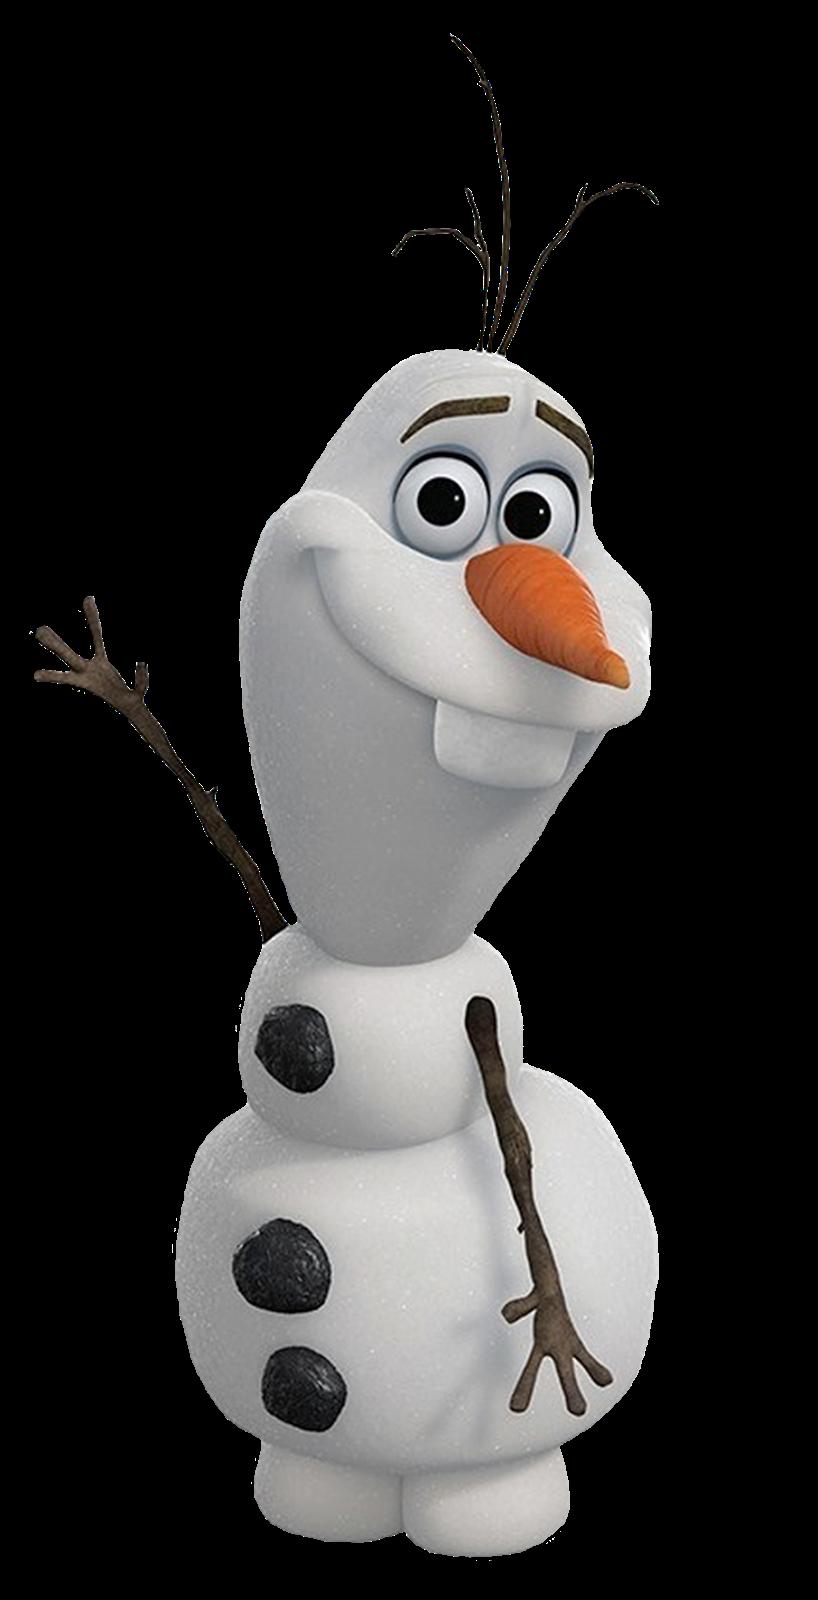 De frozen pinterest fiesta. Olaf clipart warm hug